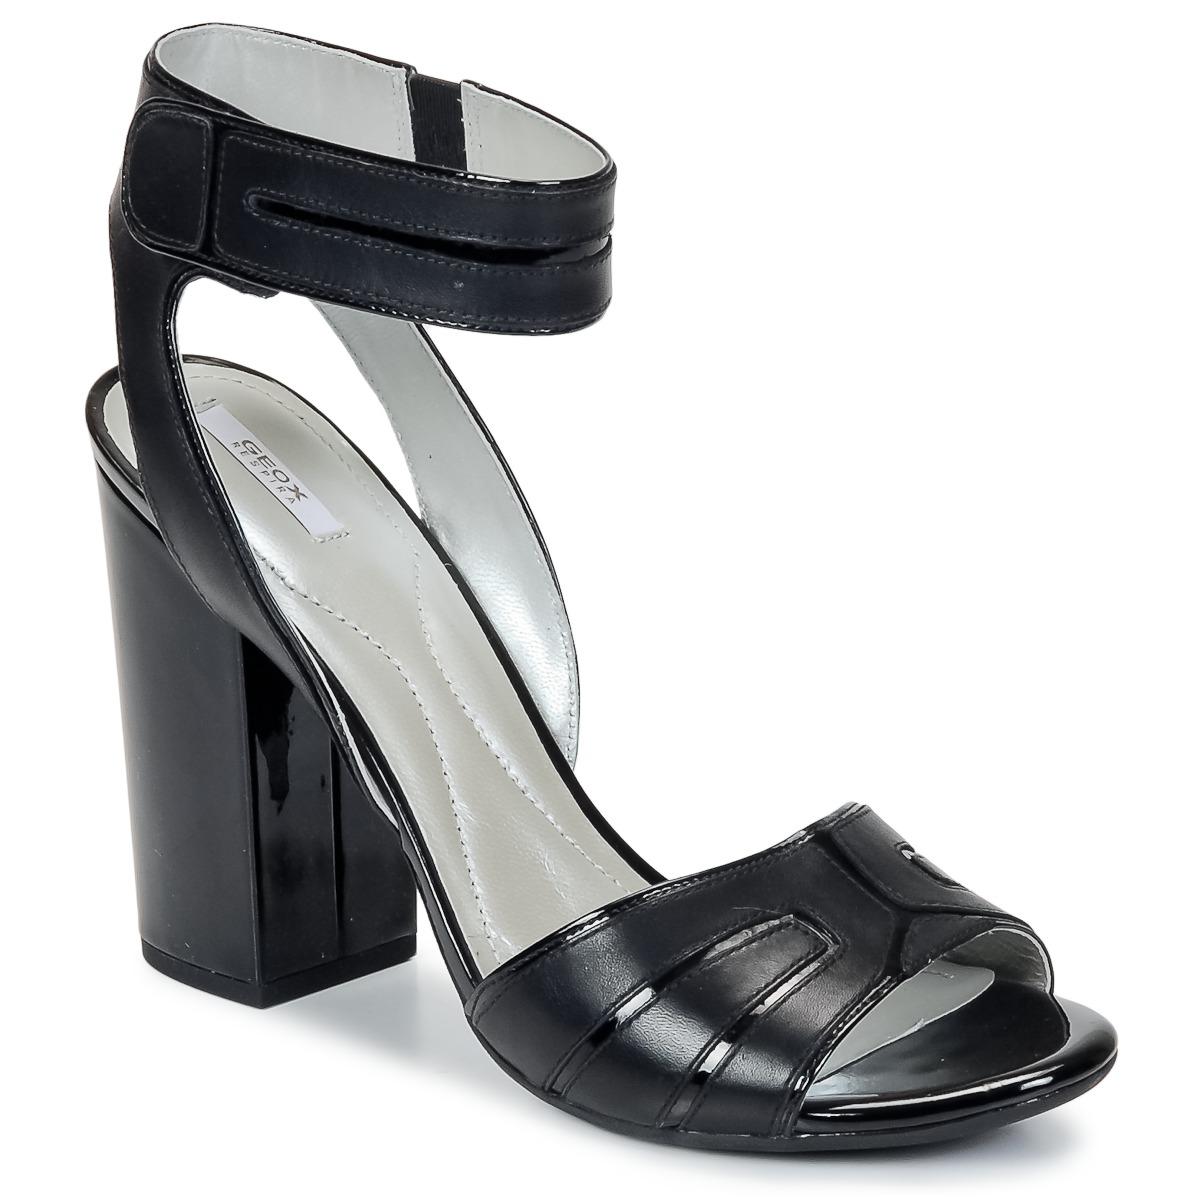 Sandale Geox NOLINA Noir